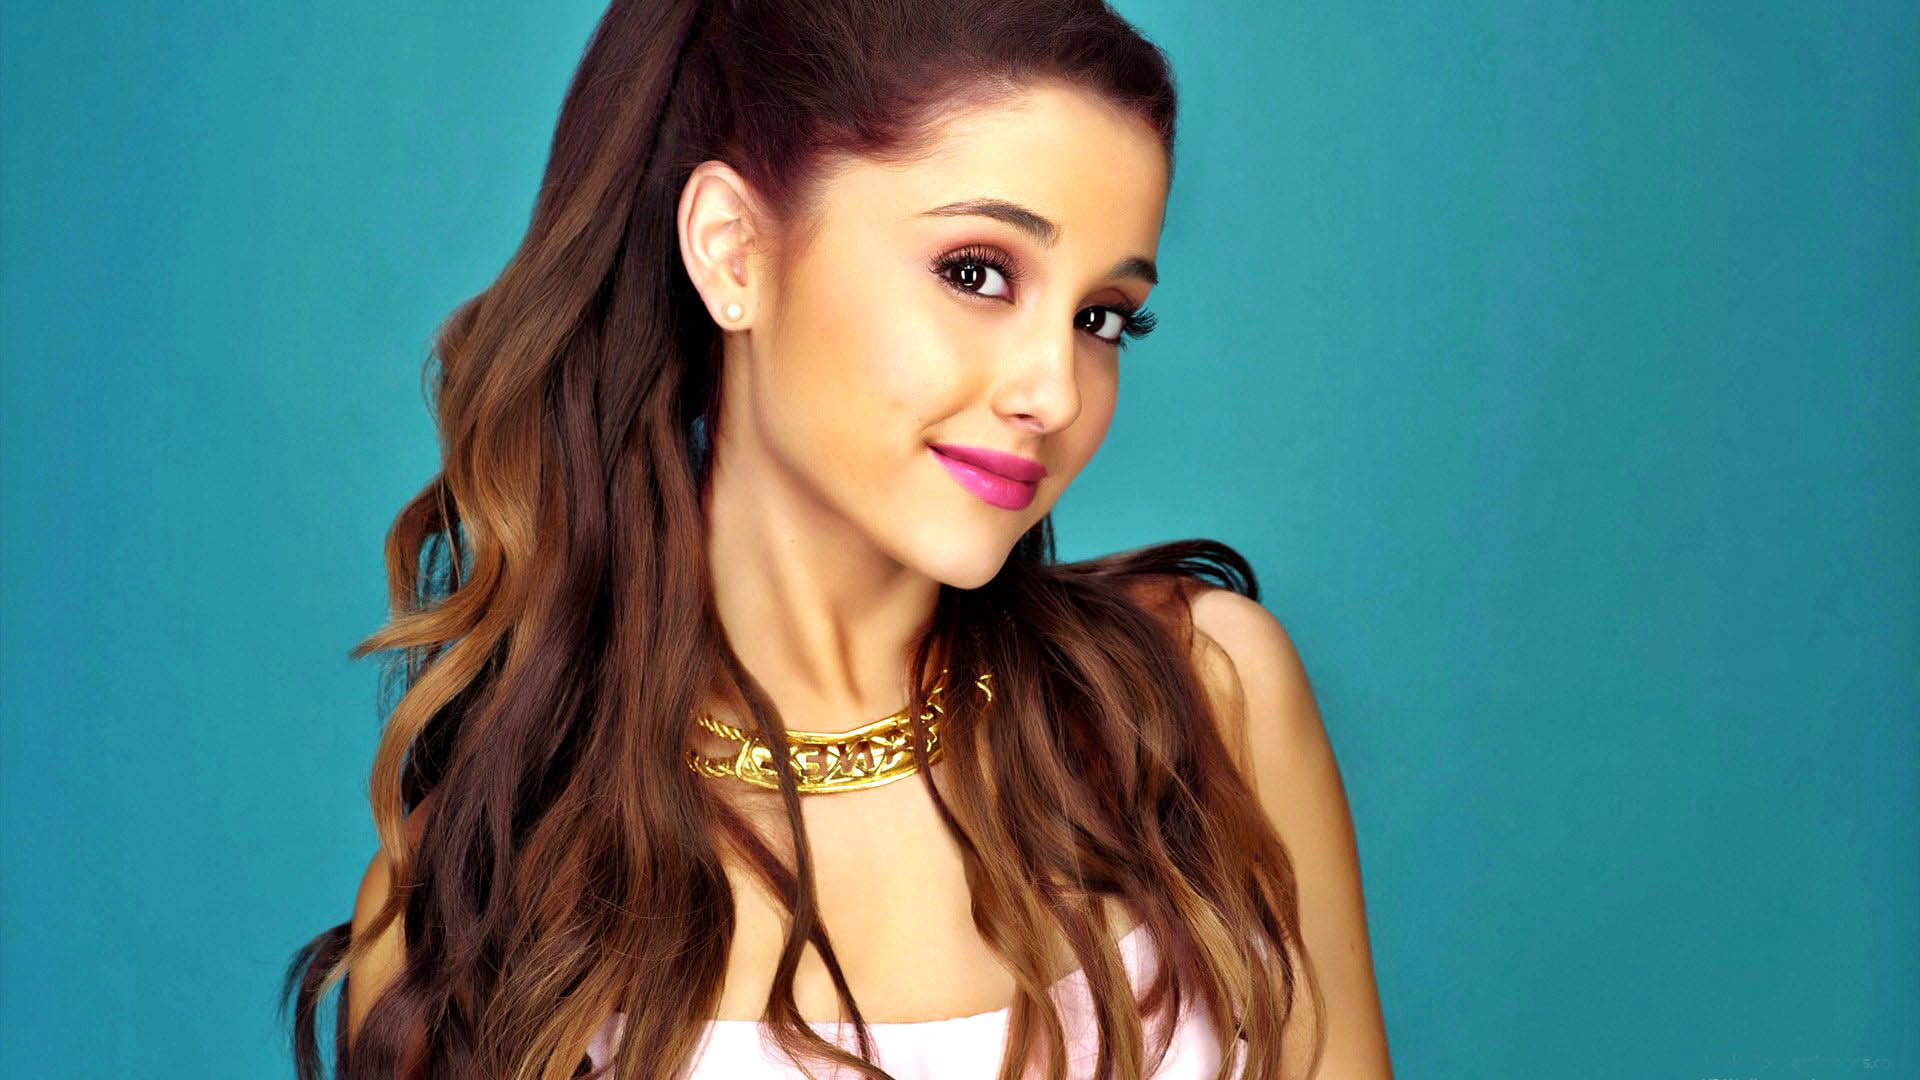 Ariana Grande cabelo comprido e preso no fundo azul